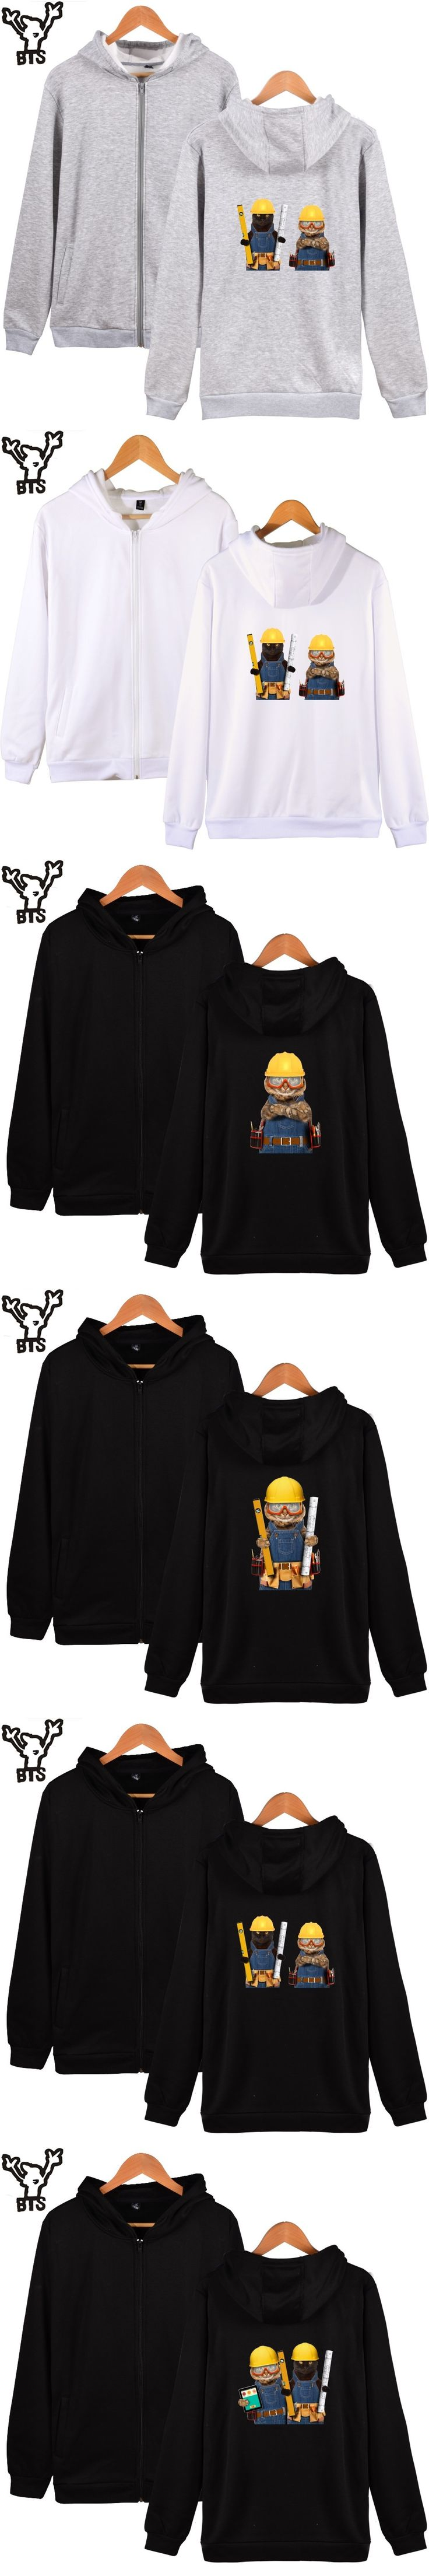 BTS Builder Cat Hoodies Men Zipper Fashion Capless Coat Winter Casual Sweatshirt Men Zipper Engineer Cat Cartoon XXS-4XL Clothes